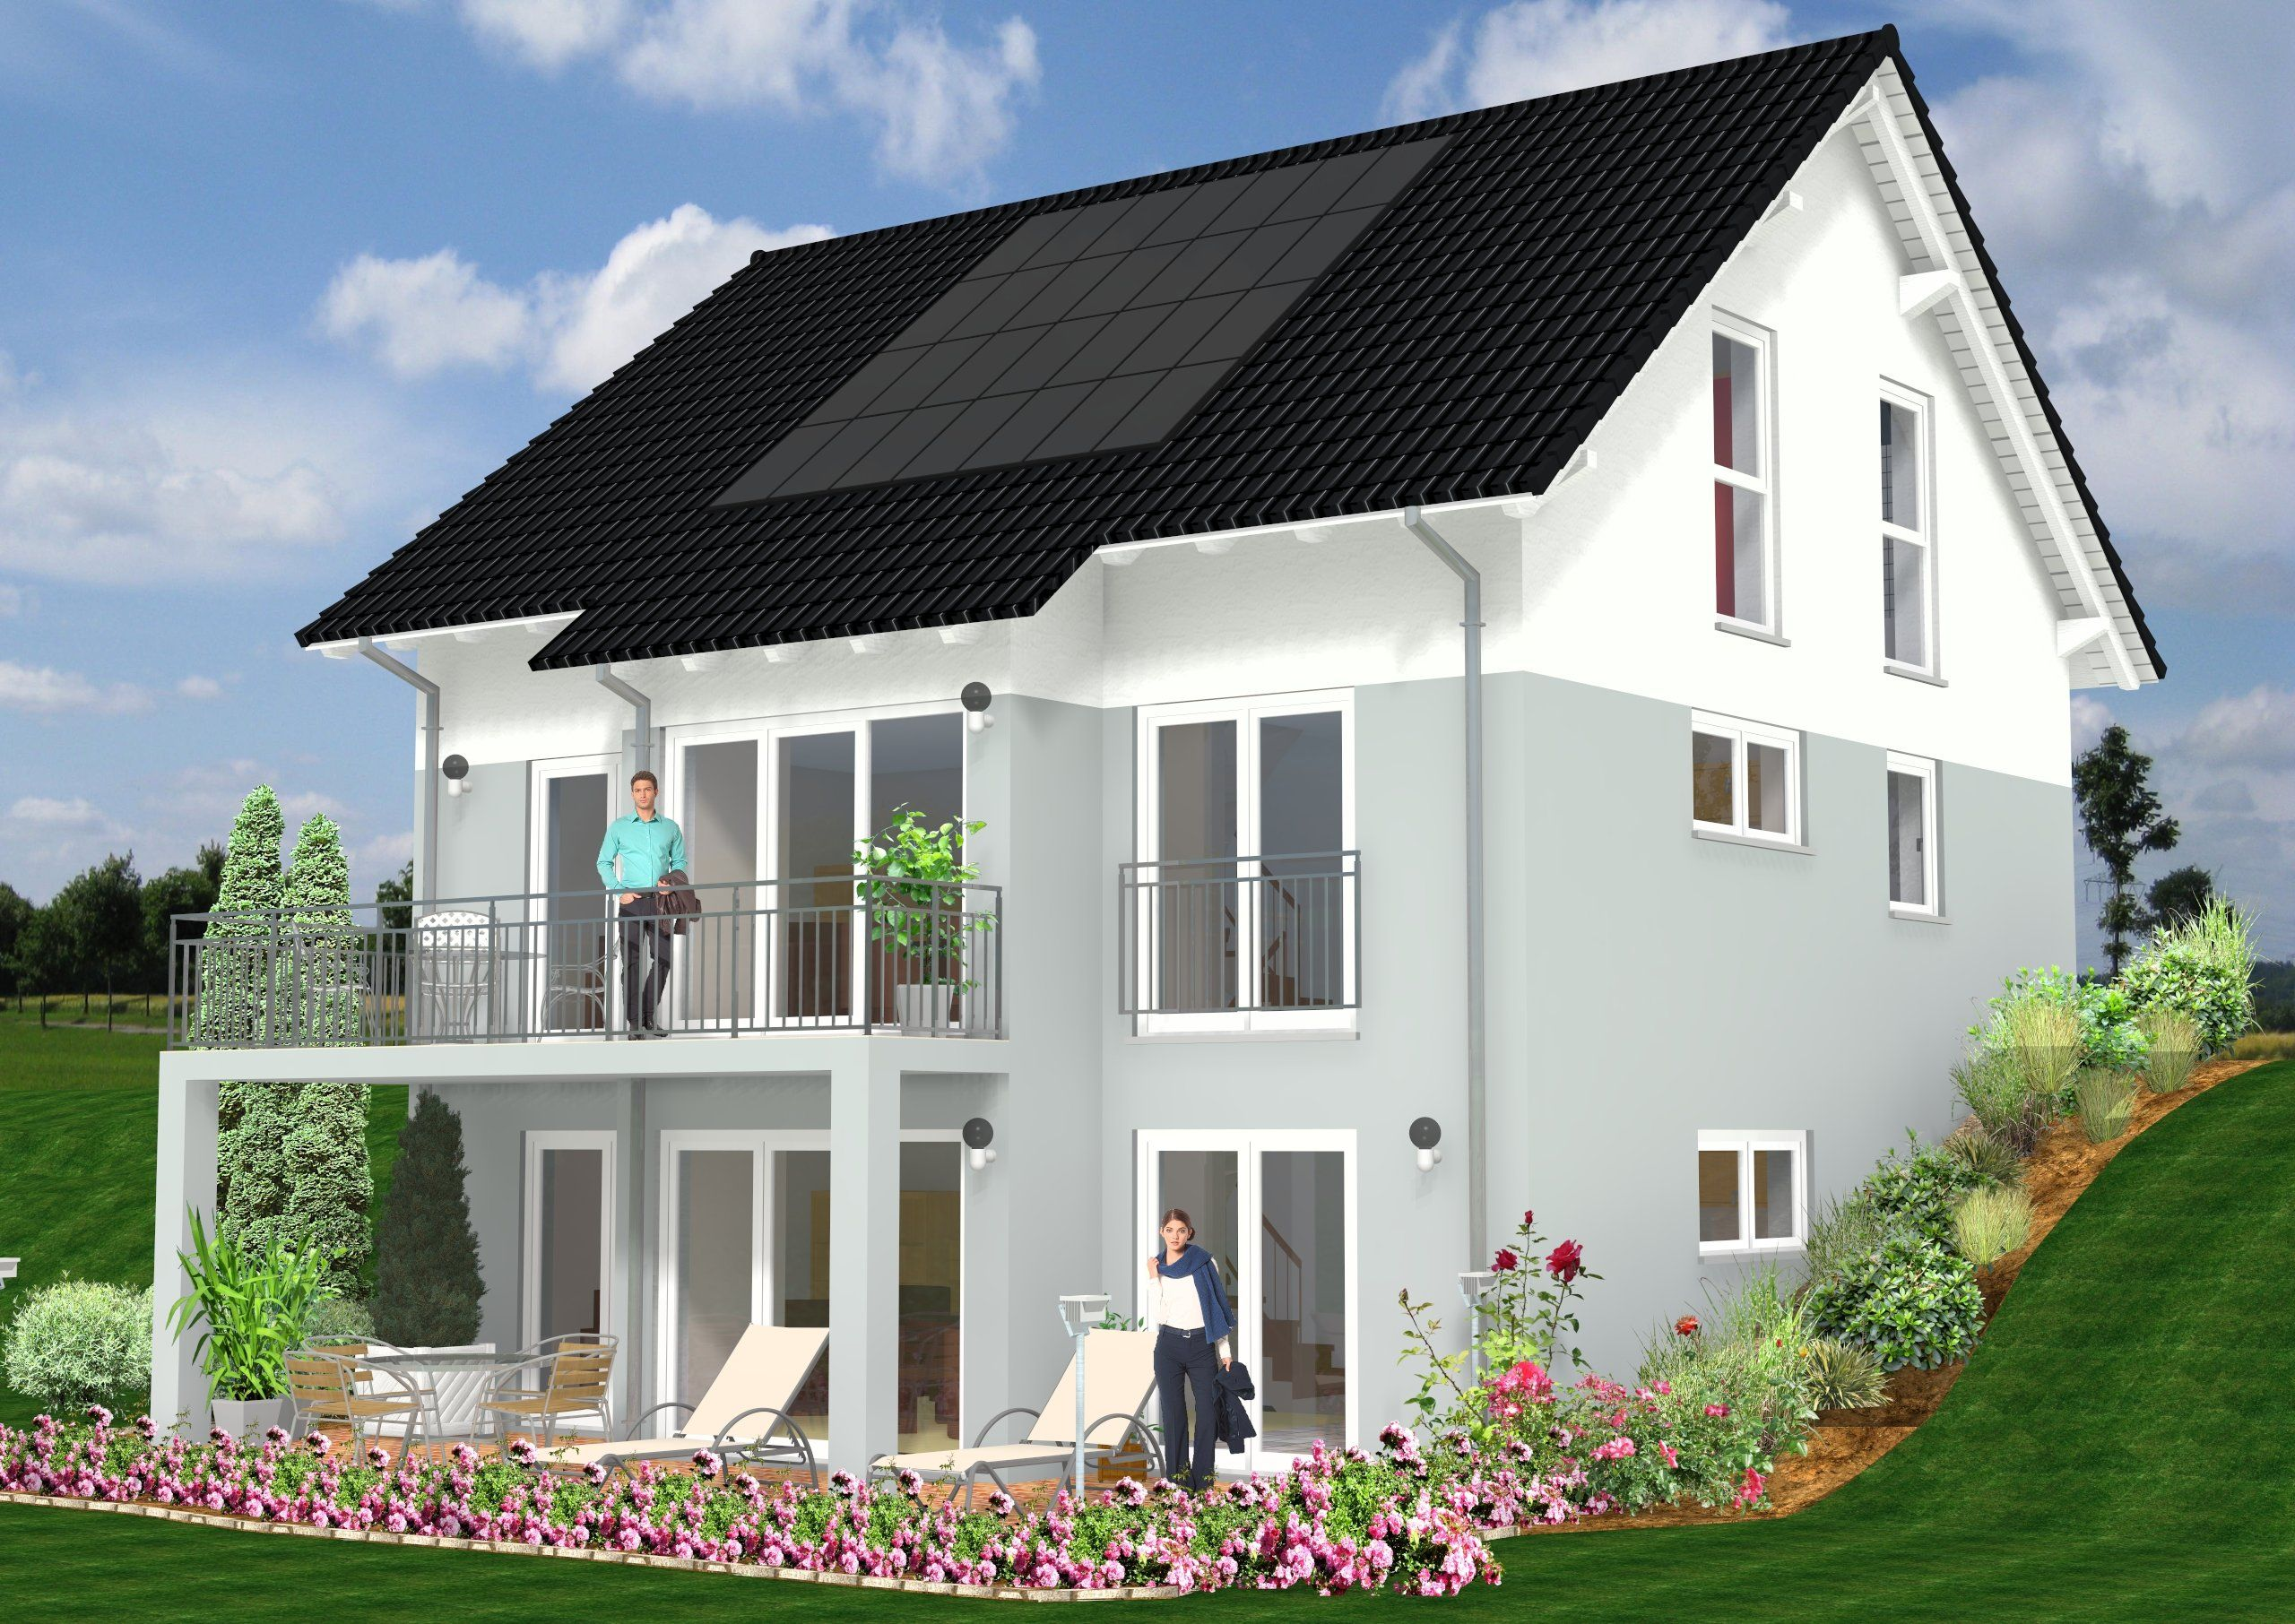 bungalow am hang mit wohnkeller wohn design. Black Bedroom Furniture Sets. Home Design Ideas